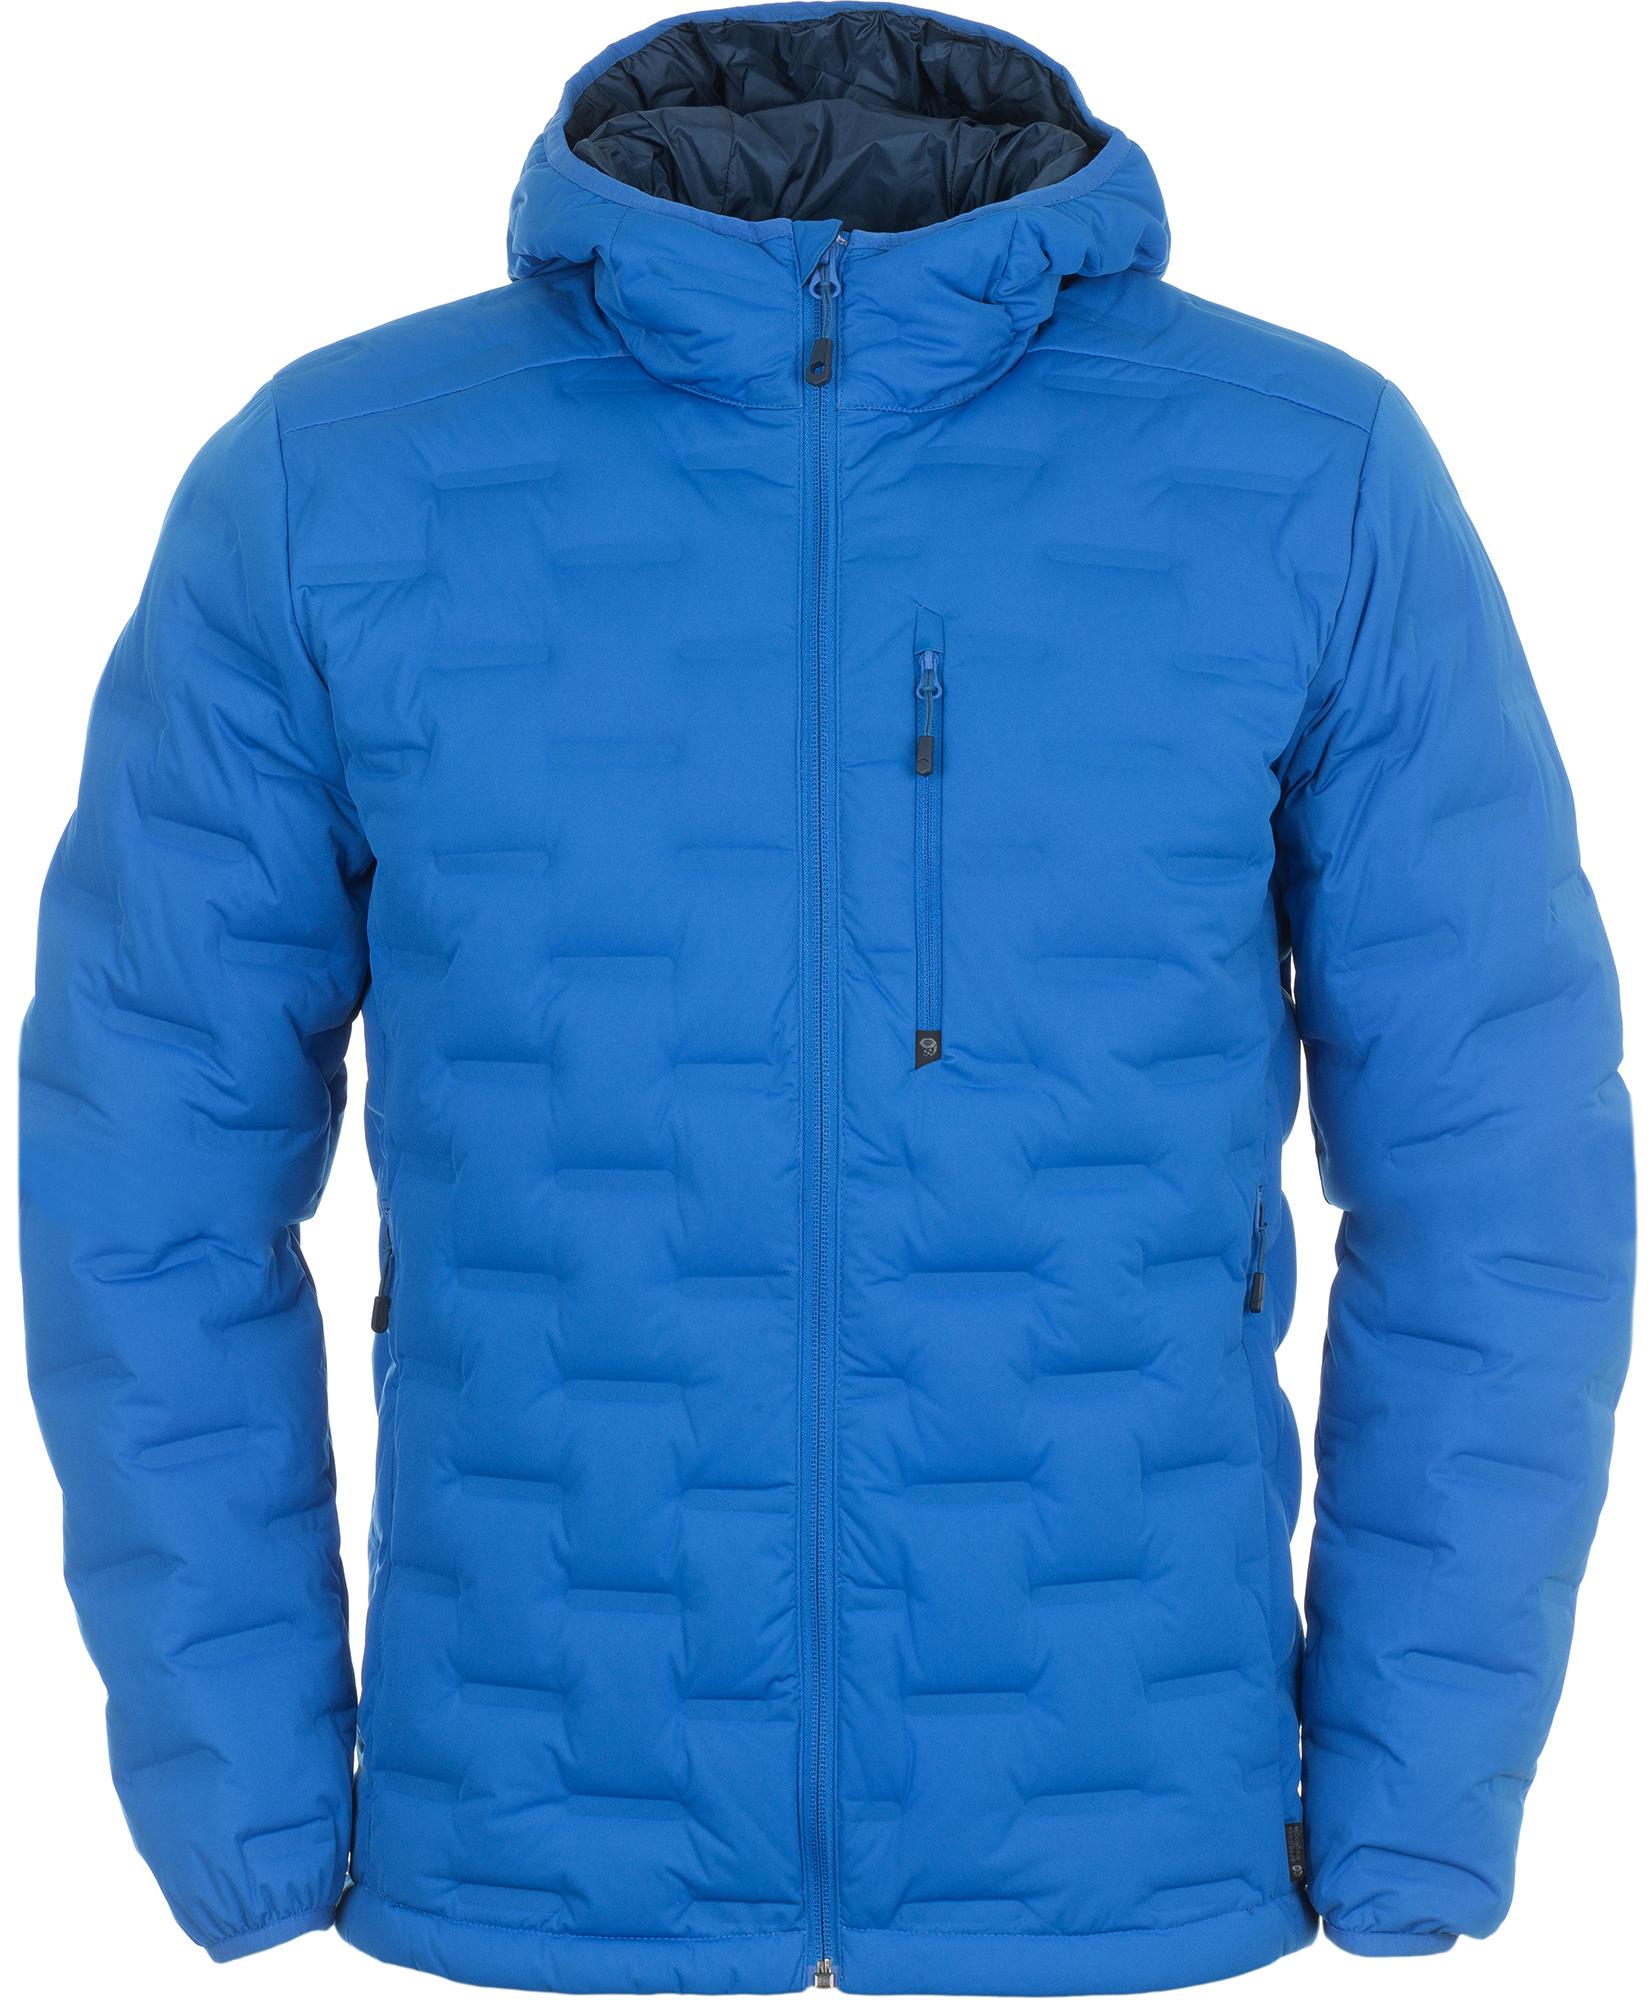 Mountain Hardwear Куртка пуховая мужская Mountain Hardwear StretchDown, размер 48 цена